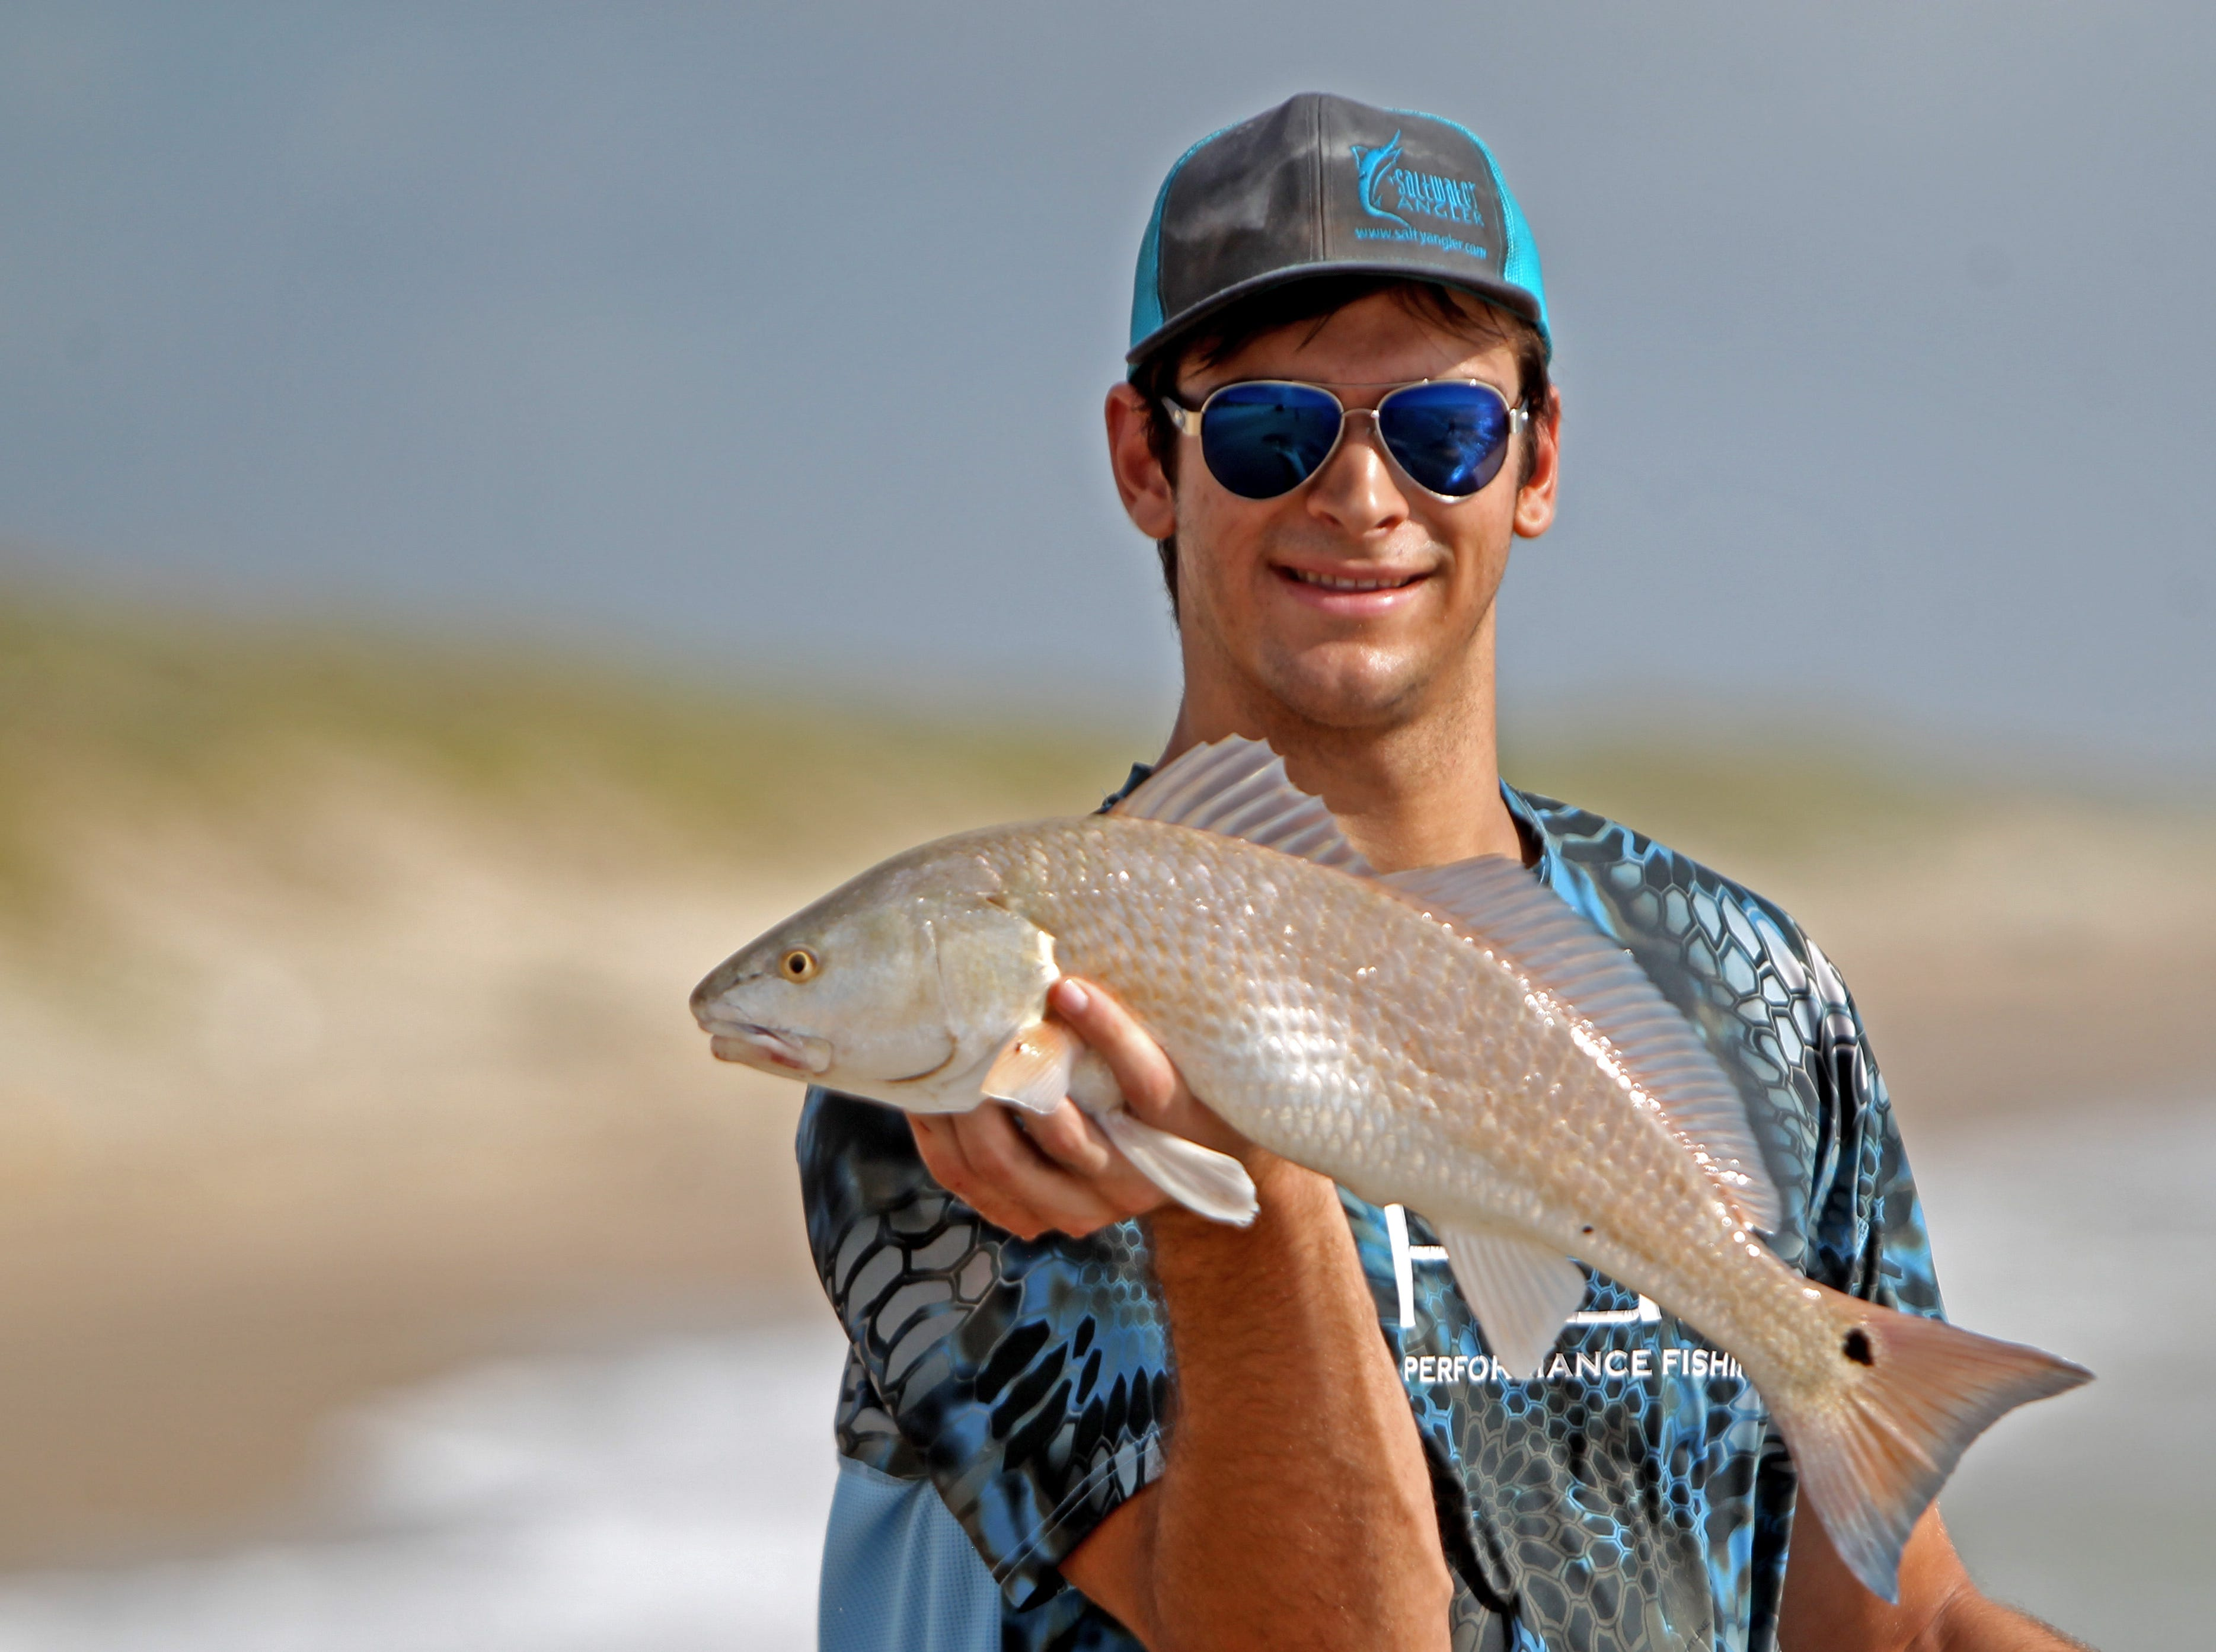 Luke McGhee caught this redfish on a silver spoon.